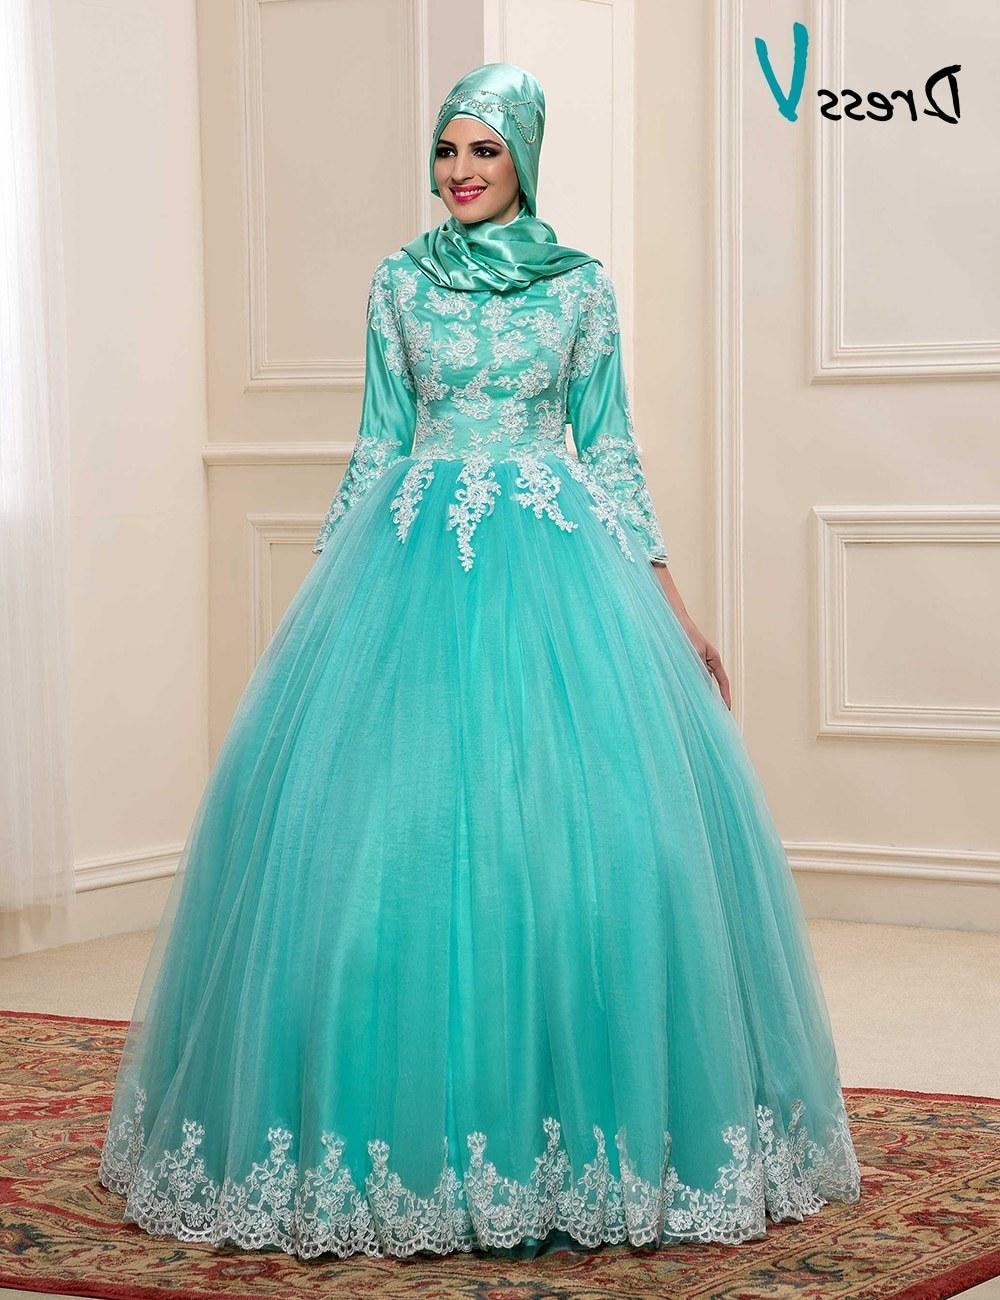 Model Inspirasi Baju Pengantin Muslimah Zwdg islamic Hijab Wedding Dresses – Fashion Dresses